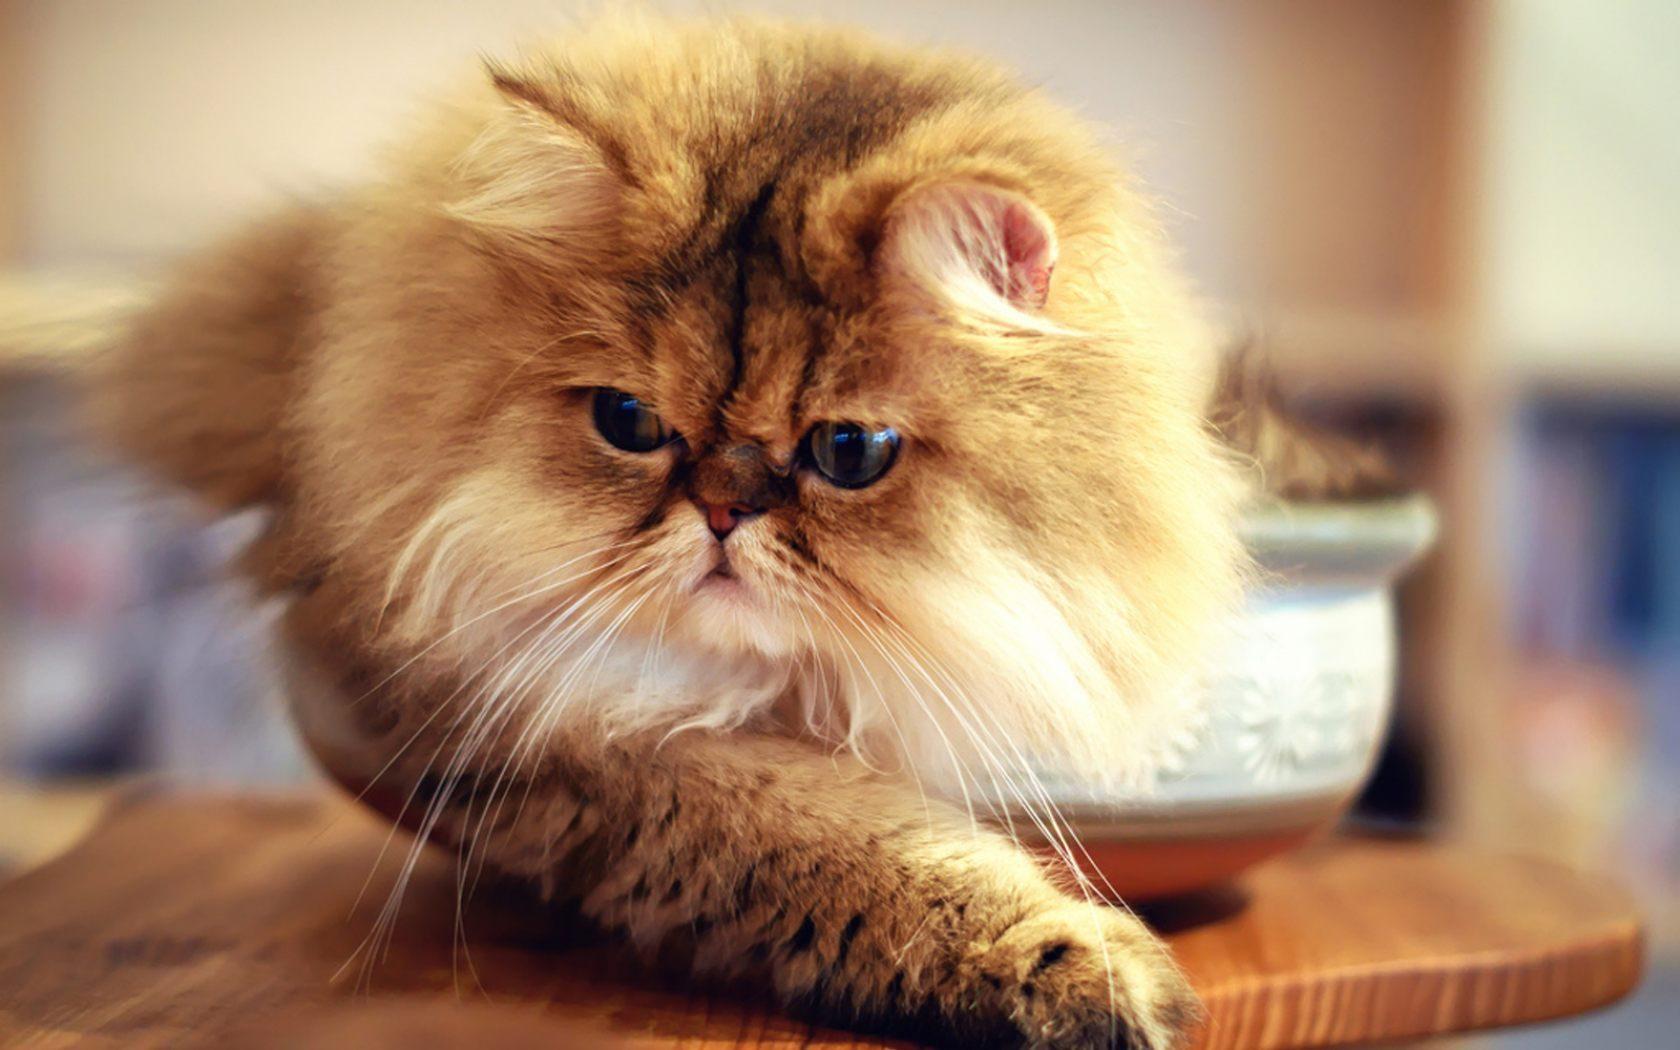 imagenes de gatos para perfil whatsapp3 Imágenes de Gatos para Perfil de Whatsapp